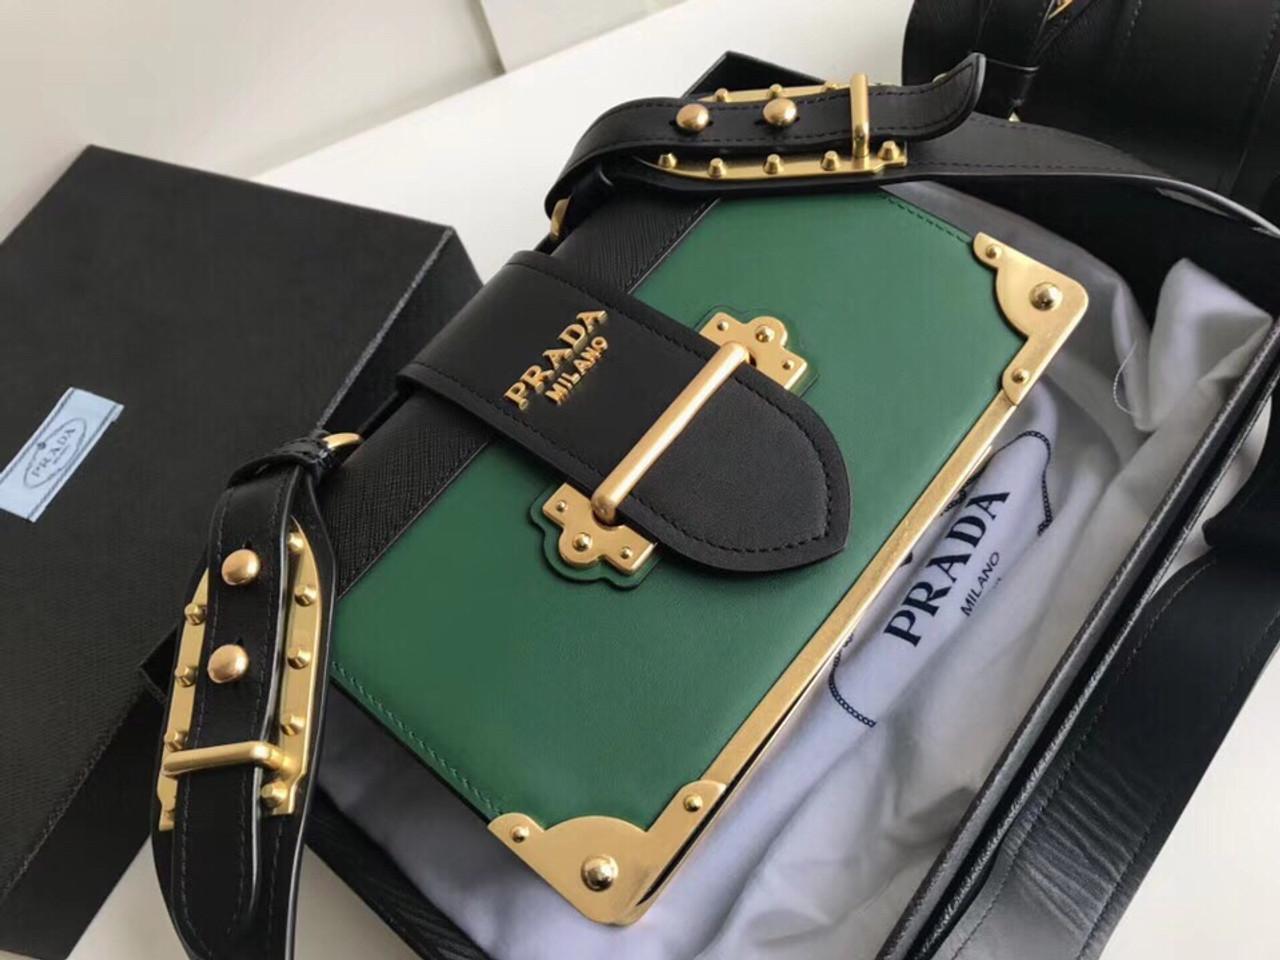 31f06c5fba8a Prada 2019 Cahier leather shoulder bag Green - Bella Vita Moda